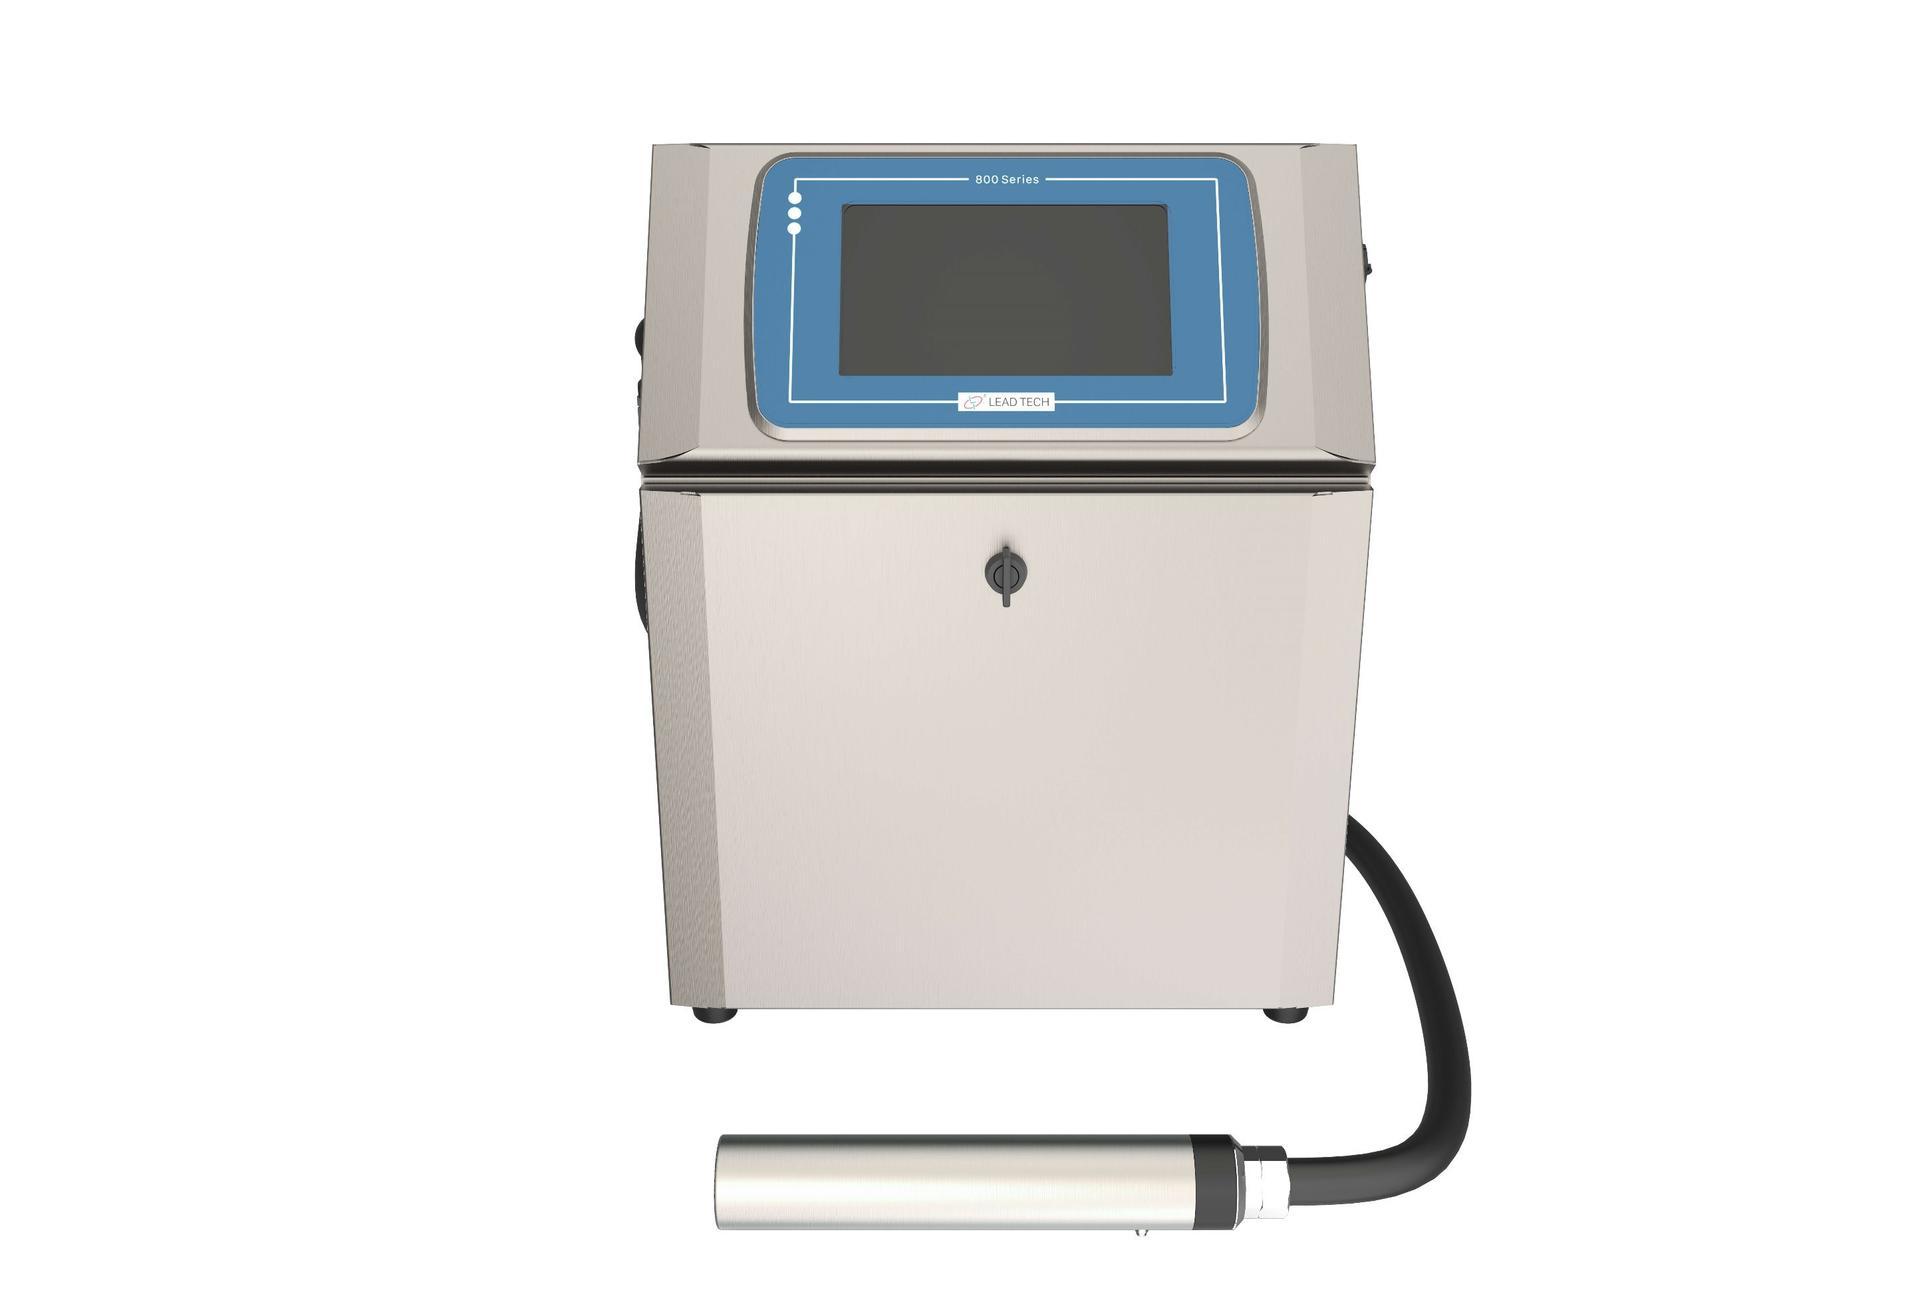 Lead Tech Lt800 High Speed Coding Cij Inkjet Printer